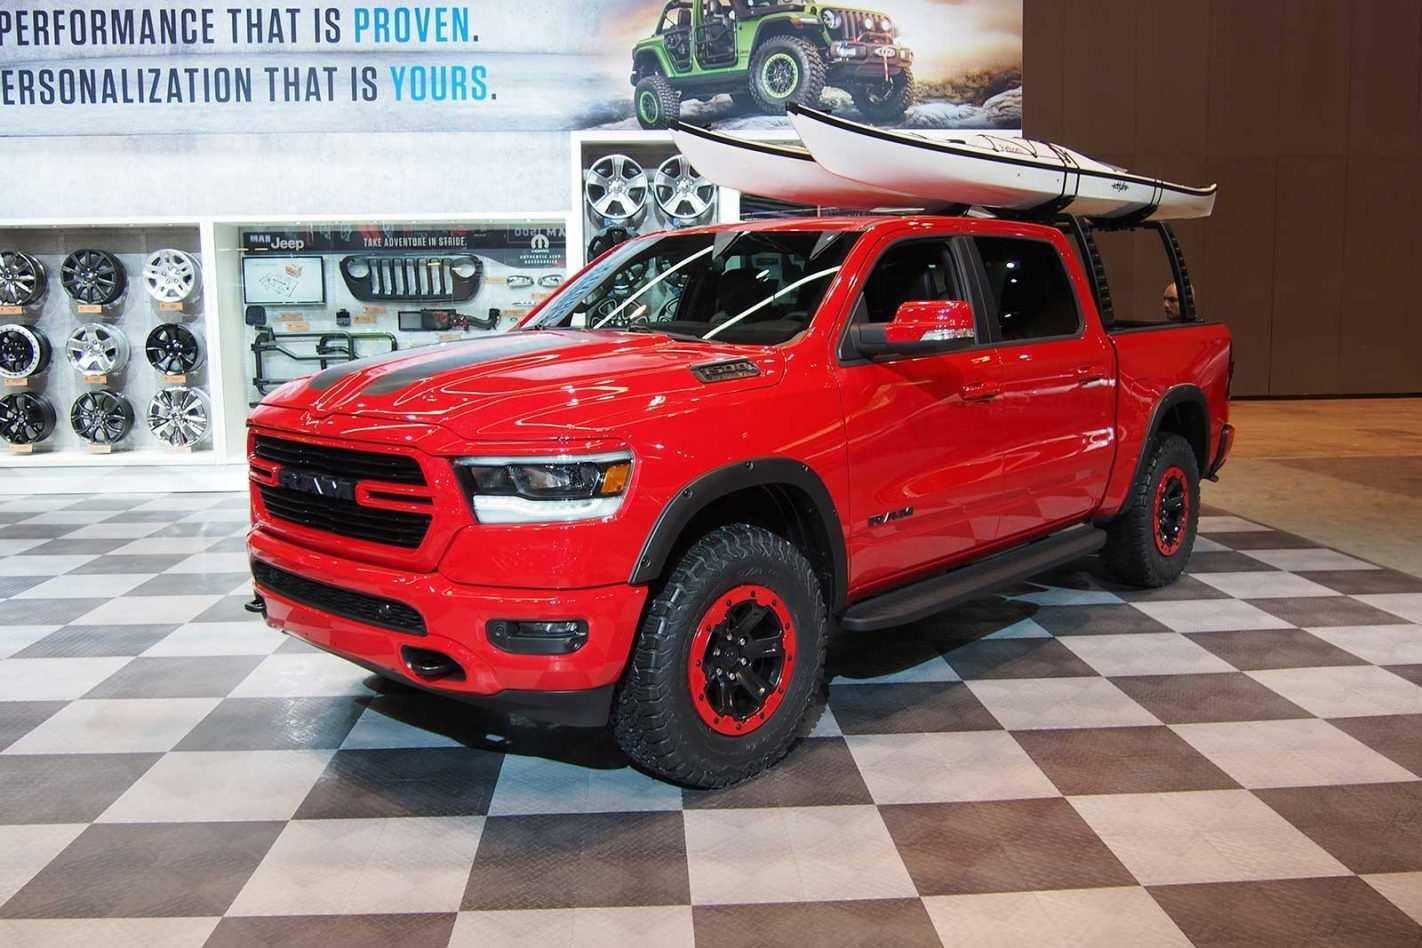 61 All New 2019 Dodge Dakota Spesification for 2019 Dodge Dakota